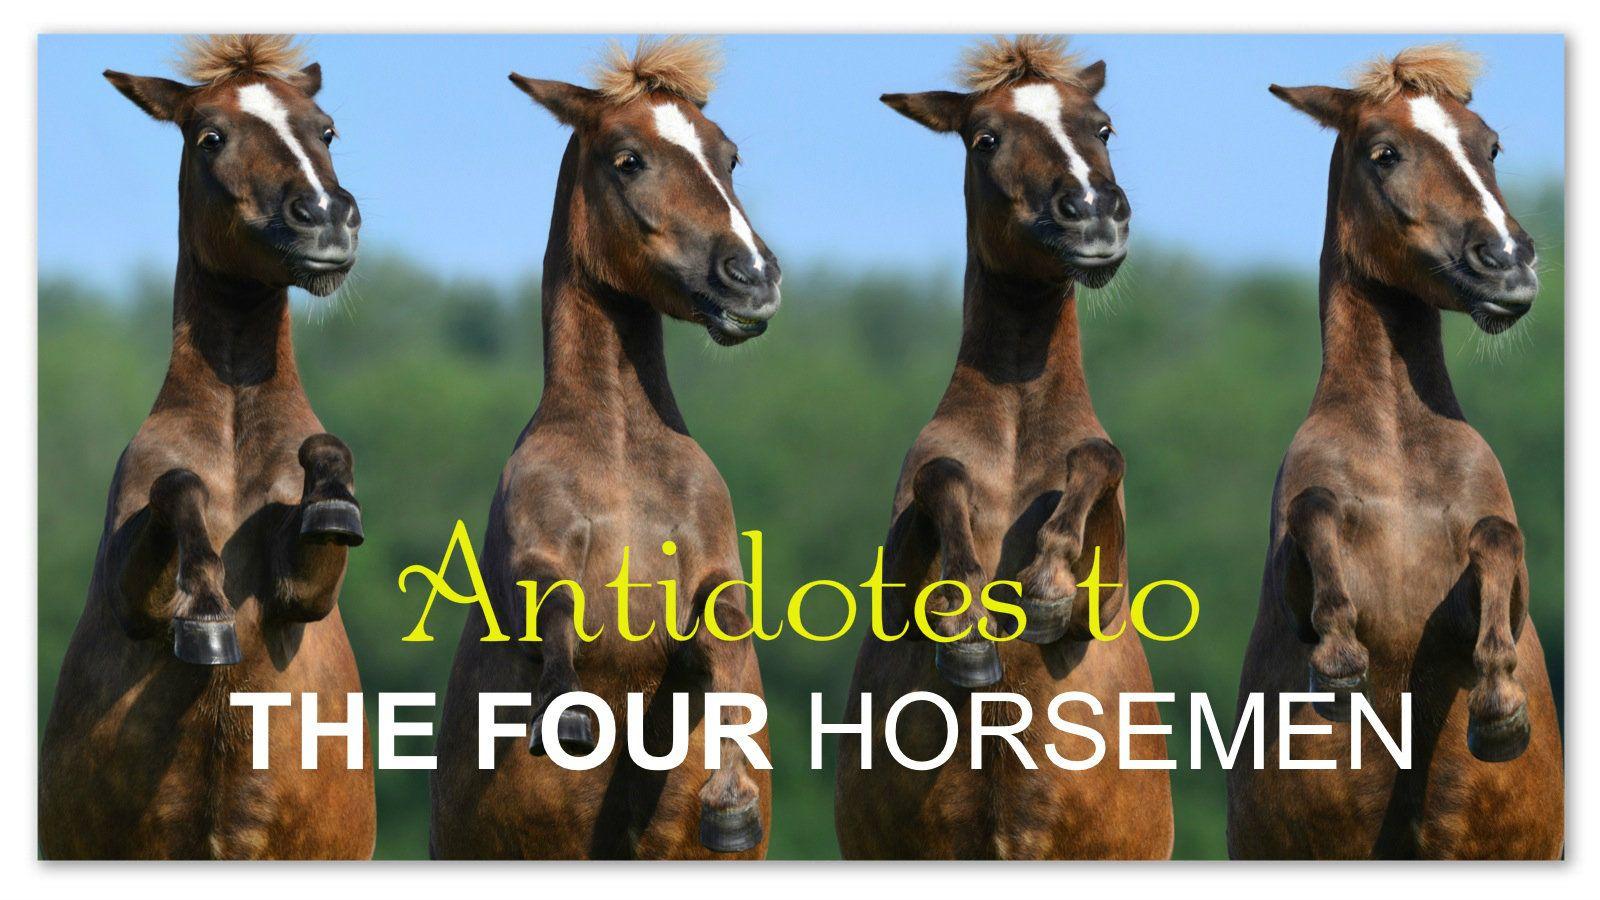 The Four Horsemen The Antidotes